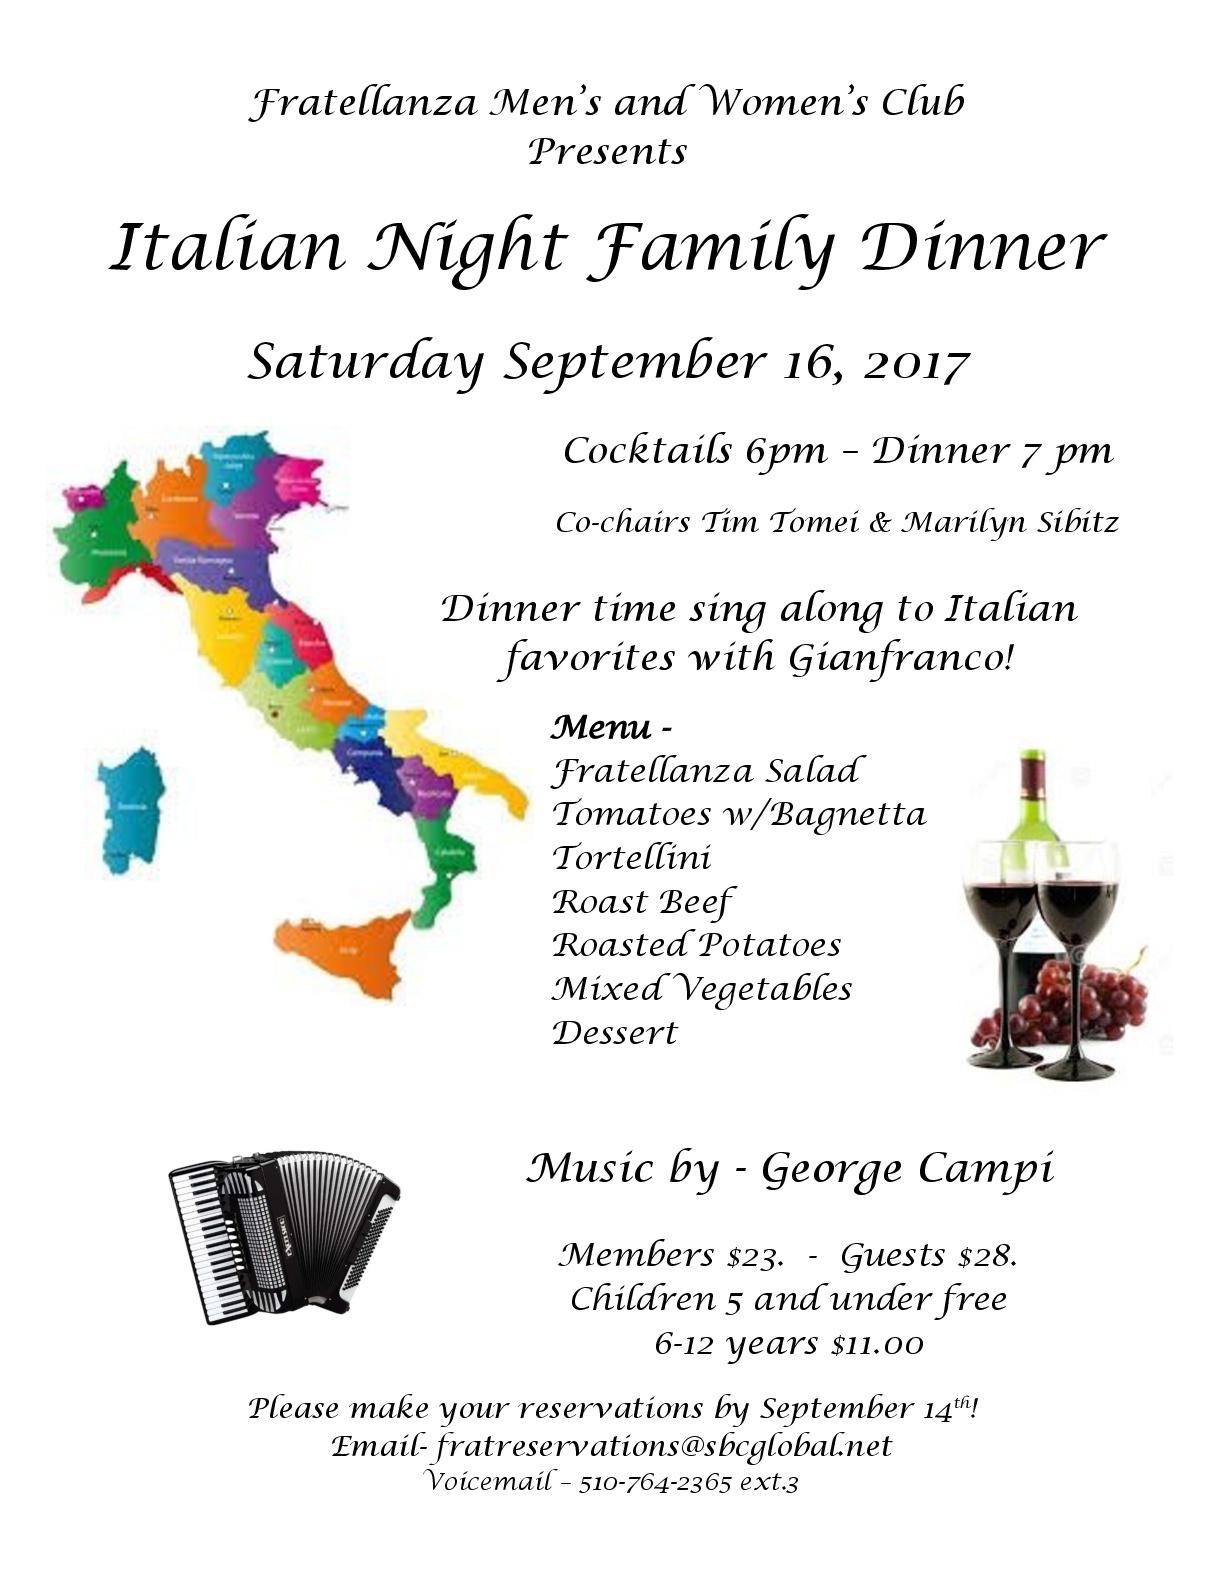 Italian Night Family Dinner – SEPT 16 – Fratellanza Club